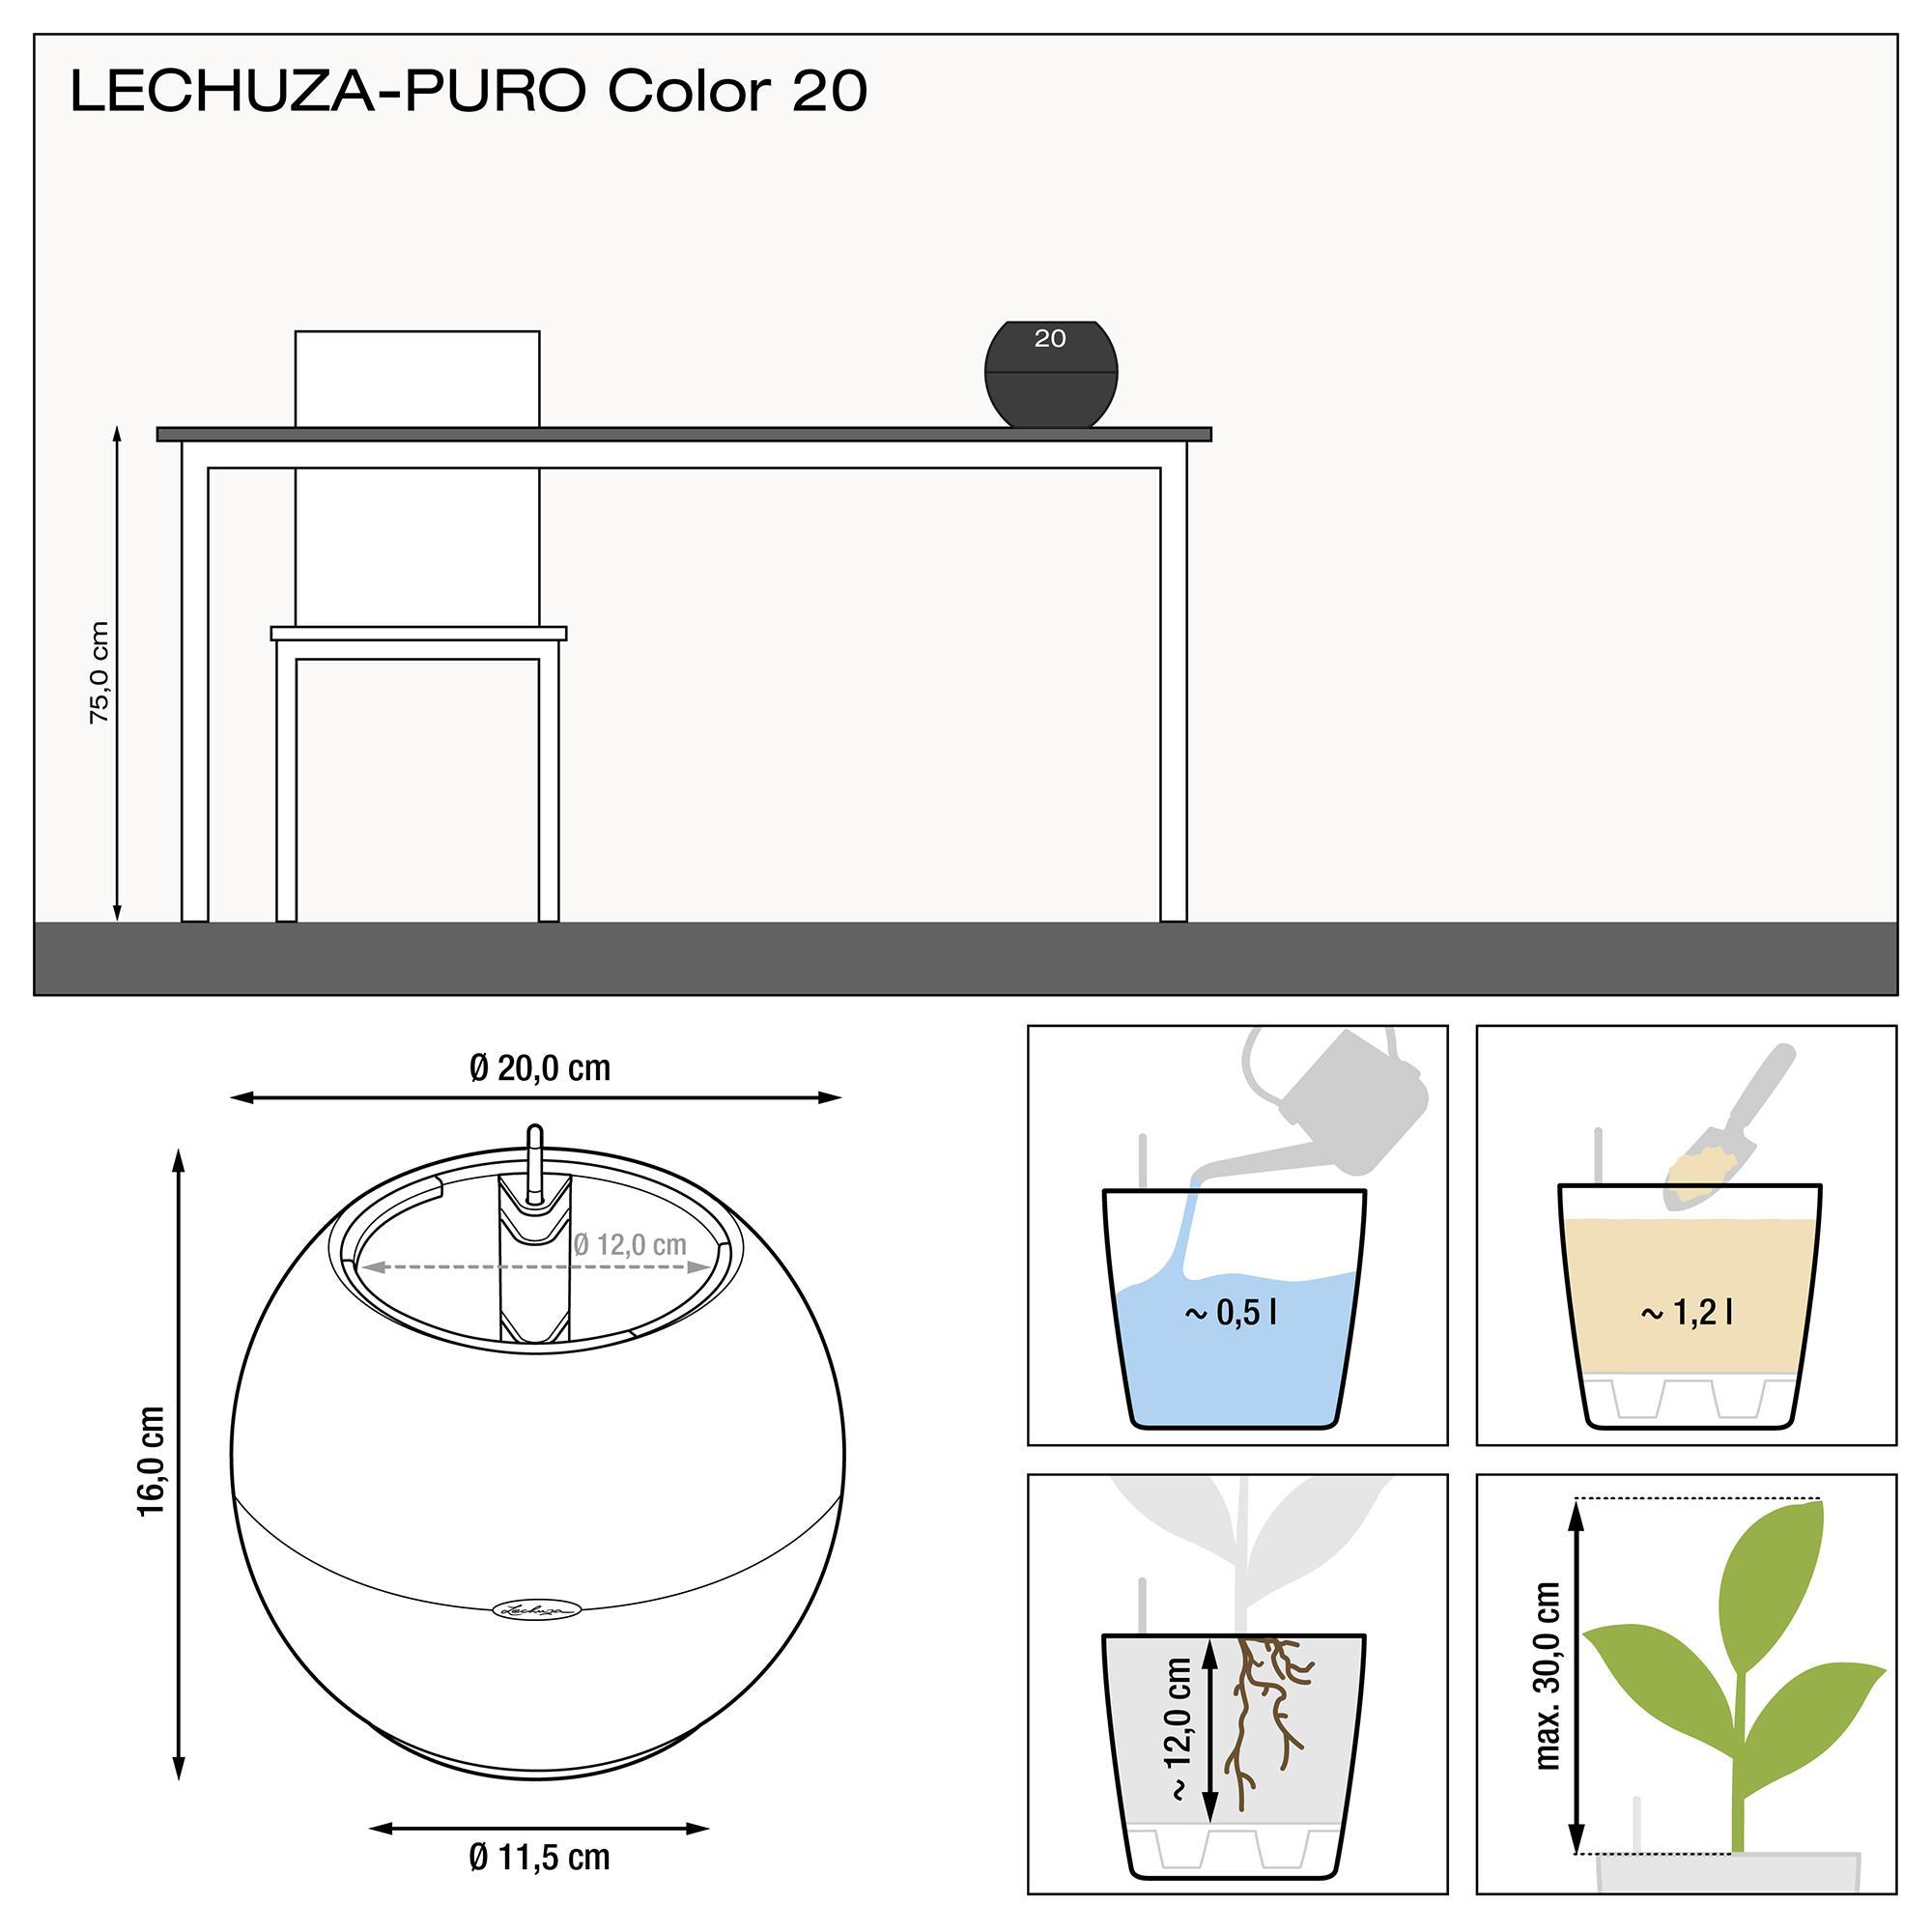 LECHUZA-PURO Color 20 slate - Image 3